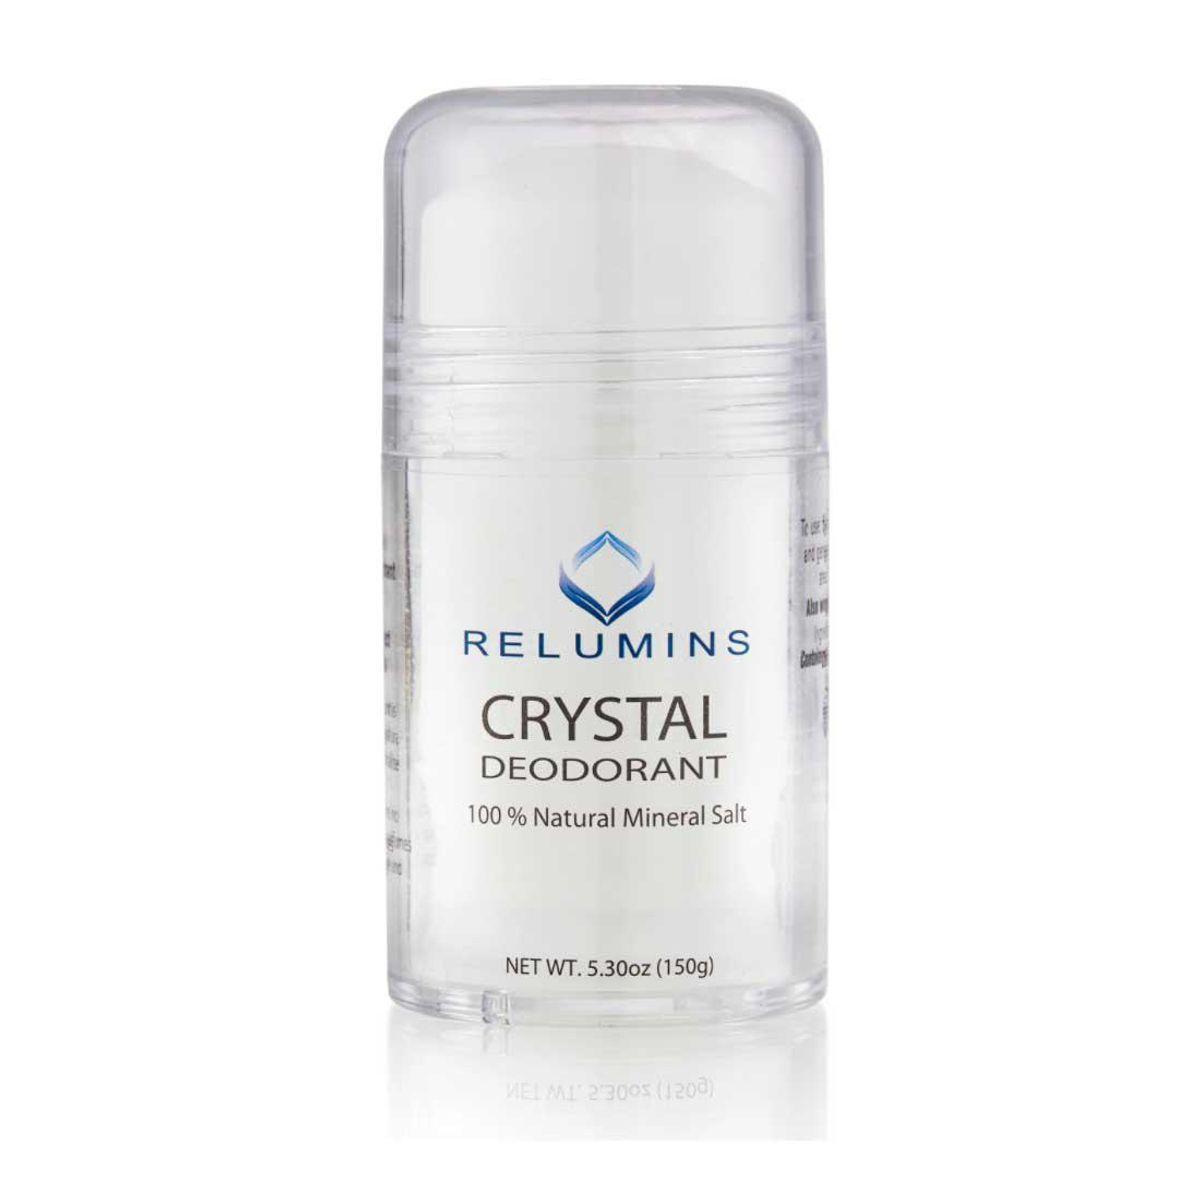 relumins natural mineral salt crystal deodorant